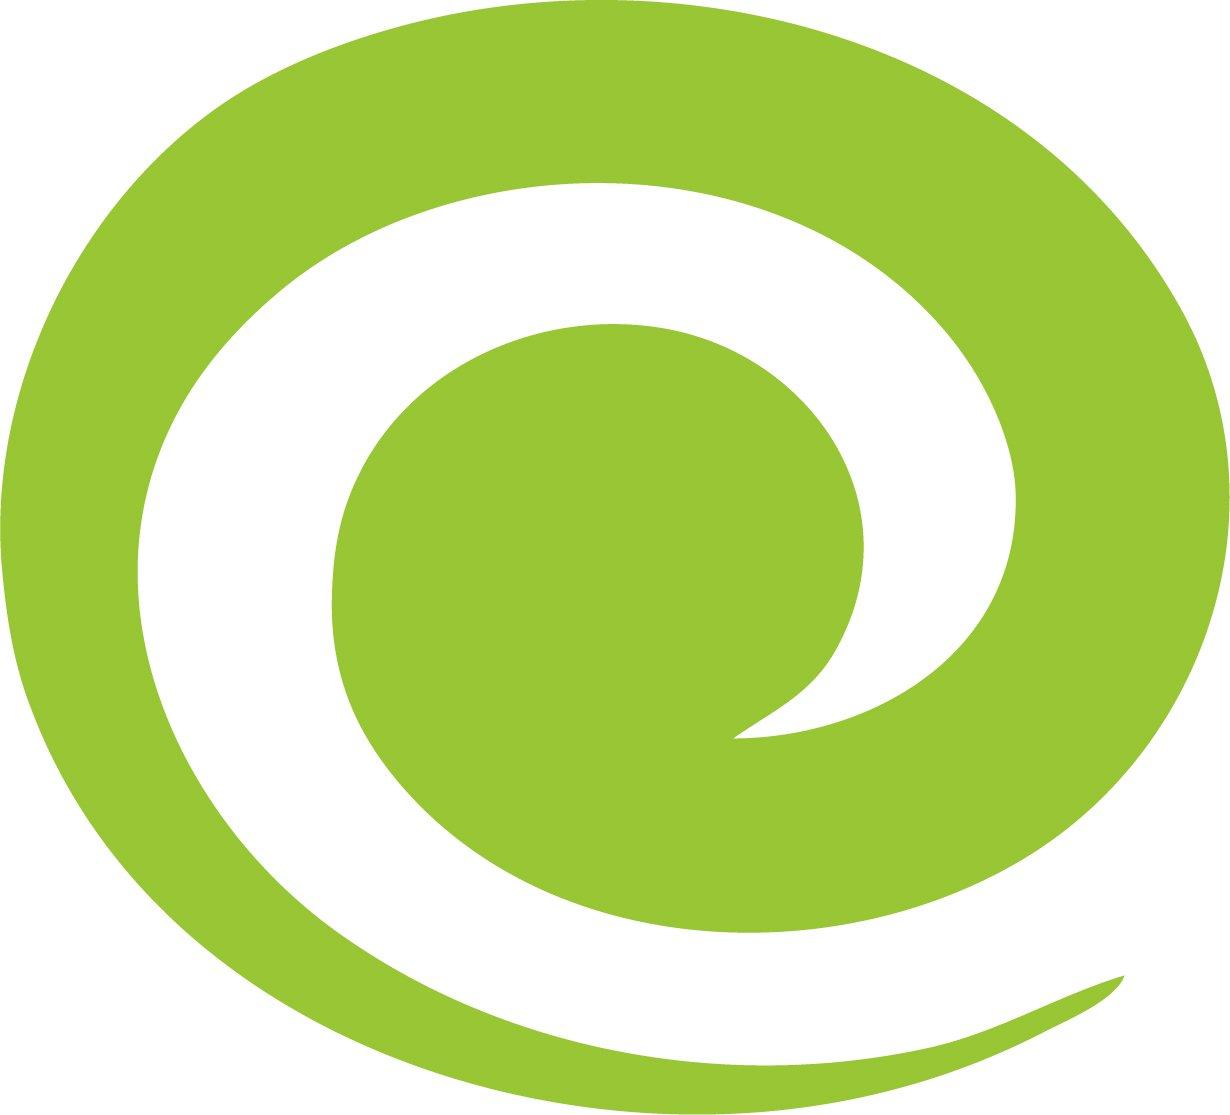 Pearland Swirl Logo